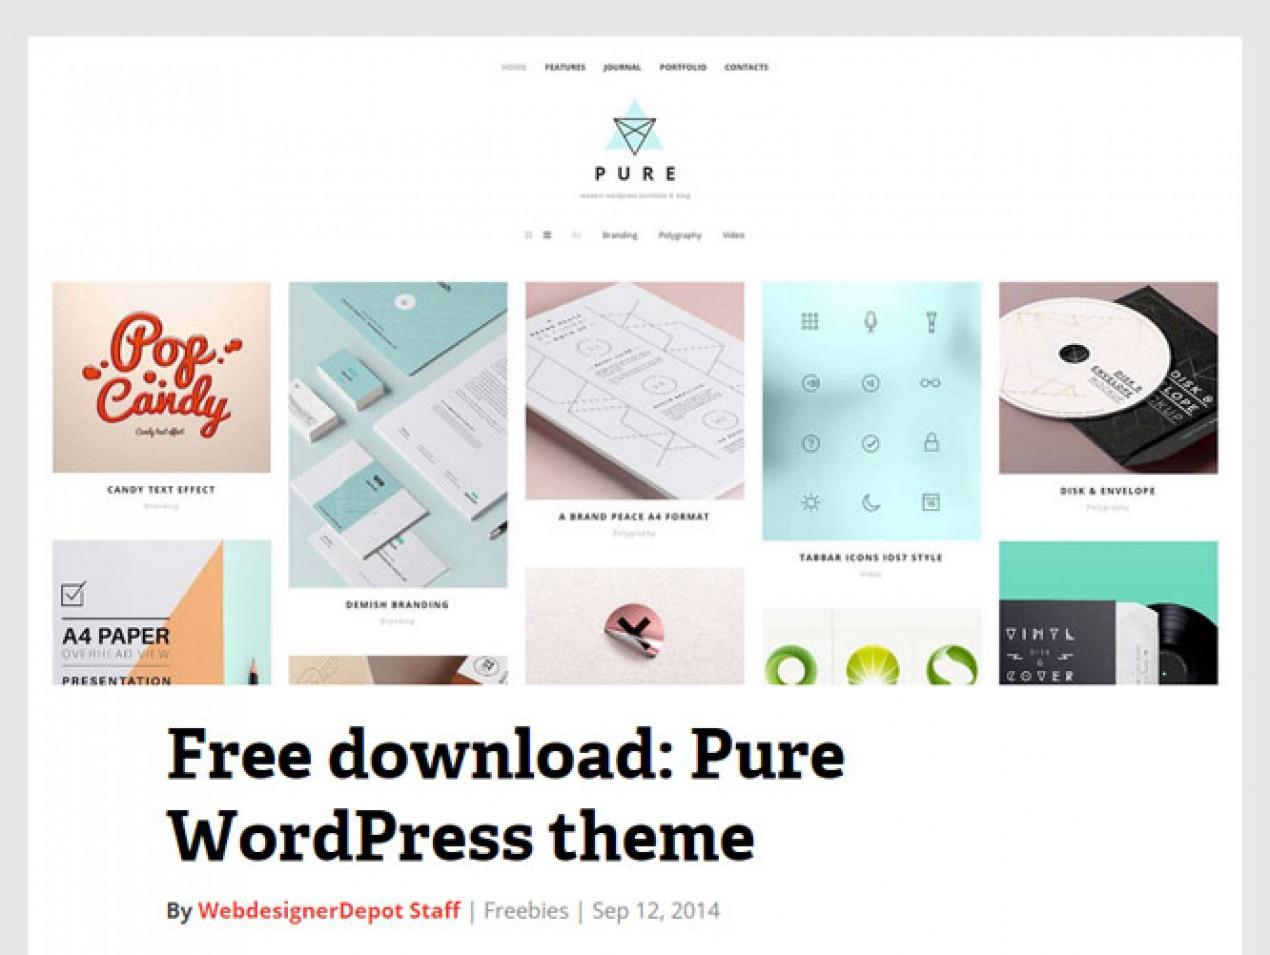 Plantillas tipo portfolio para Wordpress gratis. | Websdecorral